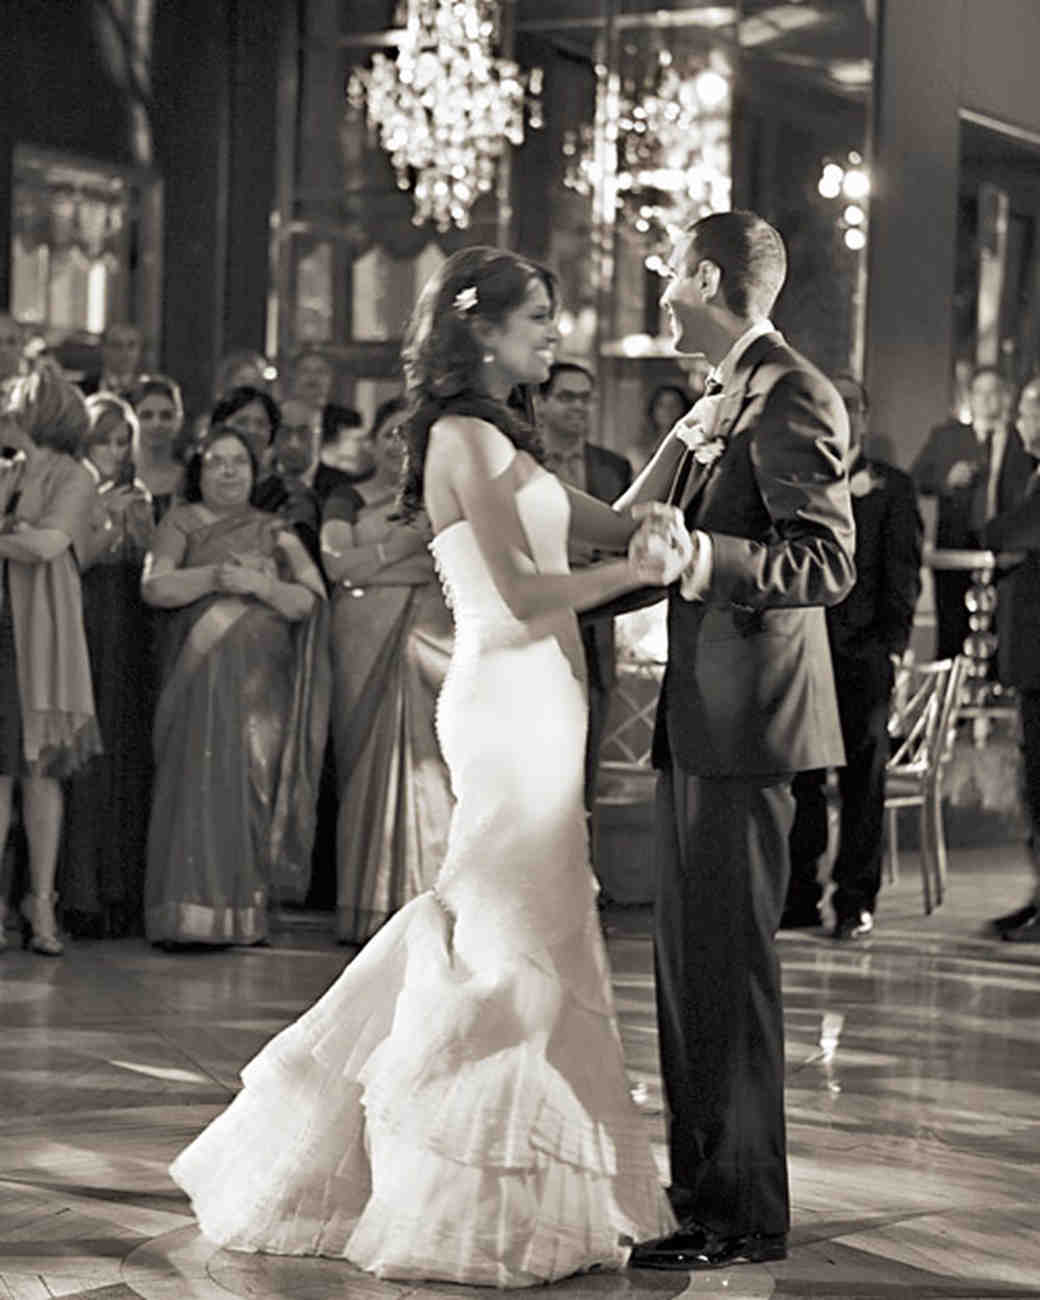 mwd104028_spr09_wedding178.jpg